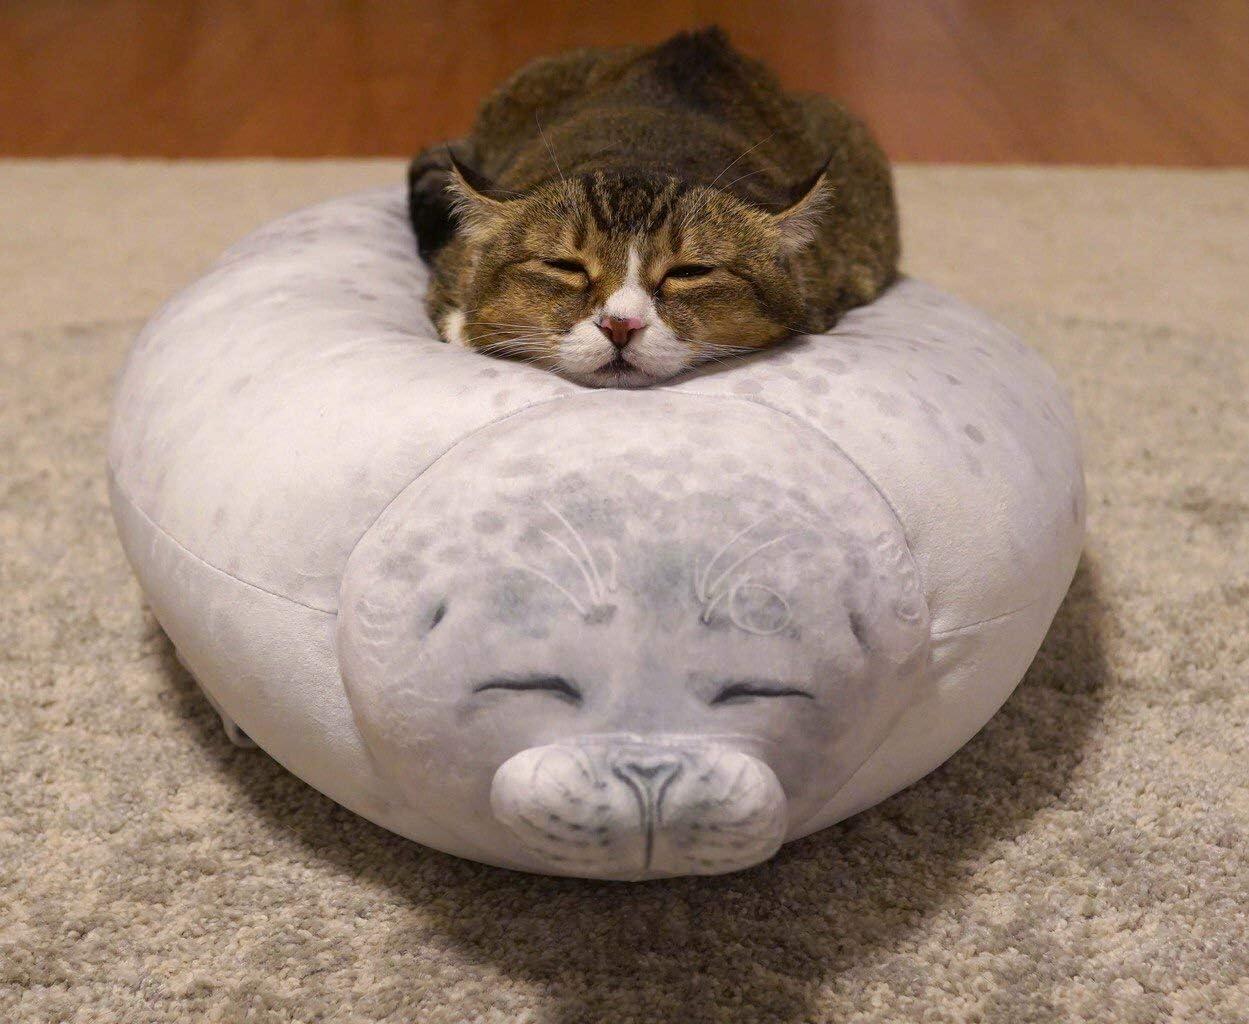 Rainlin Cute Blob Seal Pillow Round Chubby Seal Pillow Soft Hug Plush Pillow Stuffed Cotton Animals Plush Toy Small(13.0 x6.7 x5.1 inches Grey